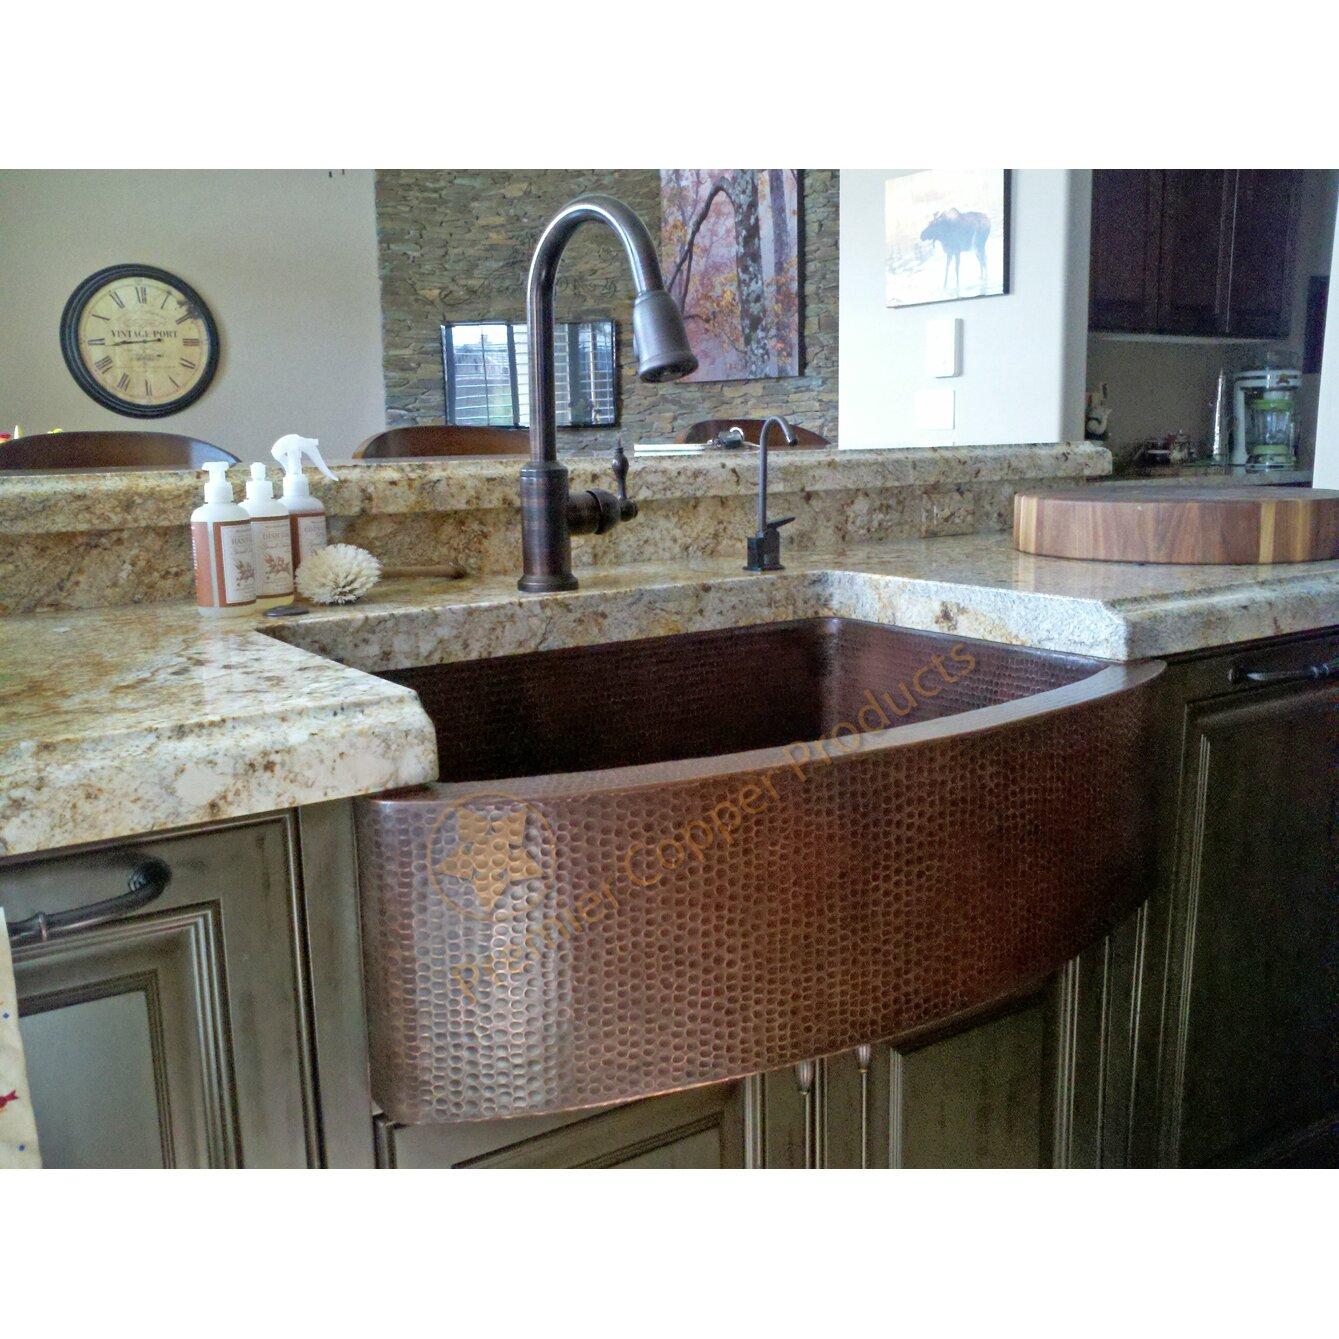 "Apron Kitchen Sink: Premier Copper Products 33"" X 24"" Hammered Apron Kitchen"